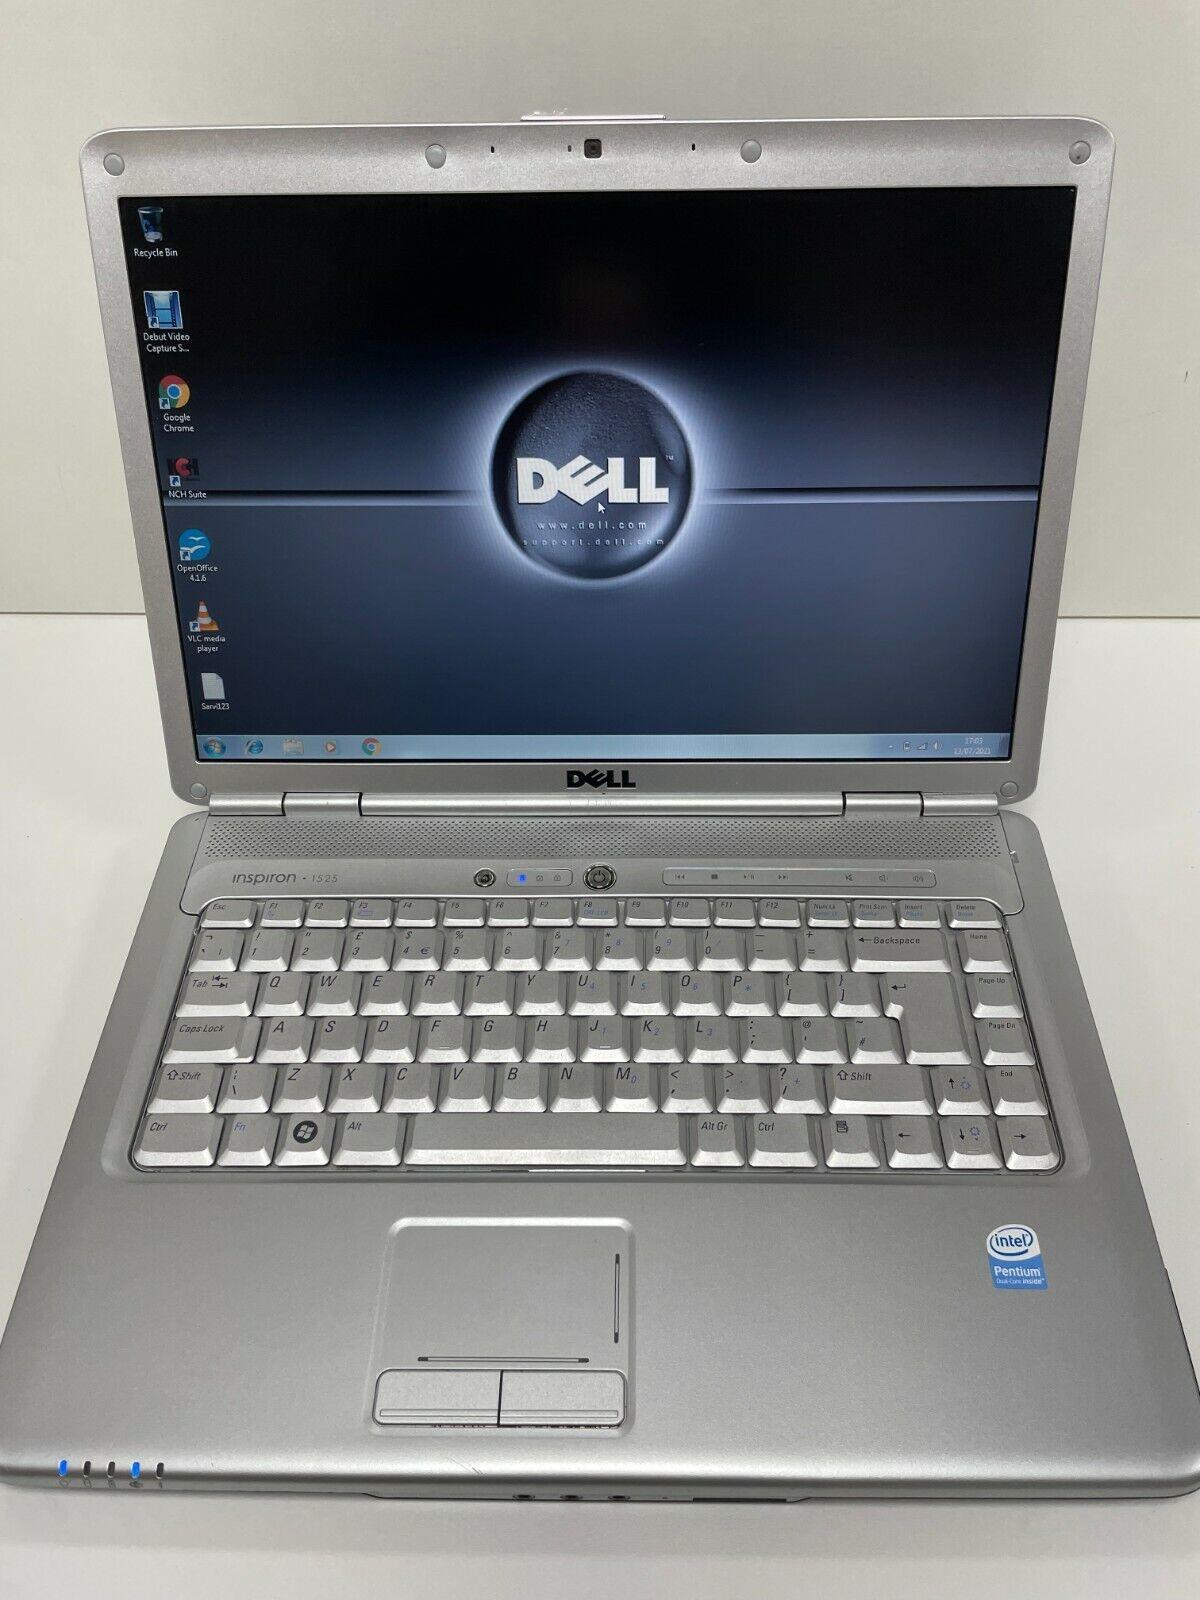 Laptop Windows - Dell Inspiron 1525 Laptop Windows 7 home premium